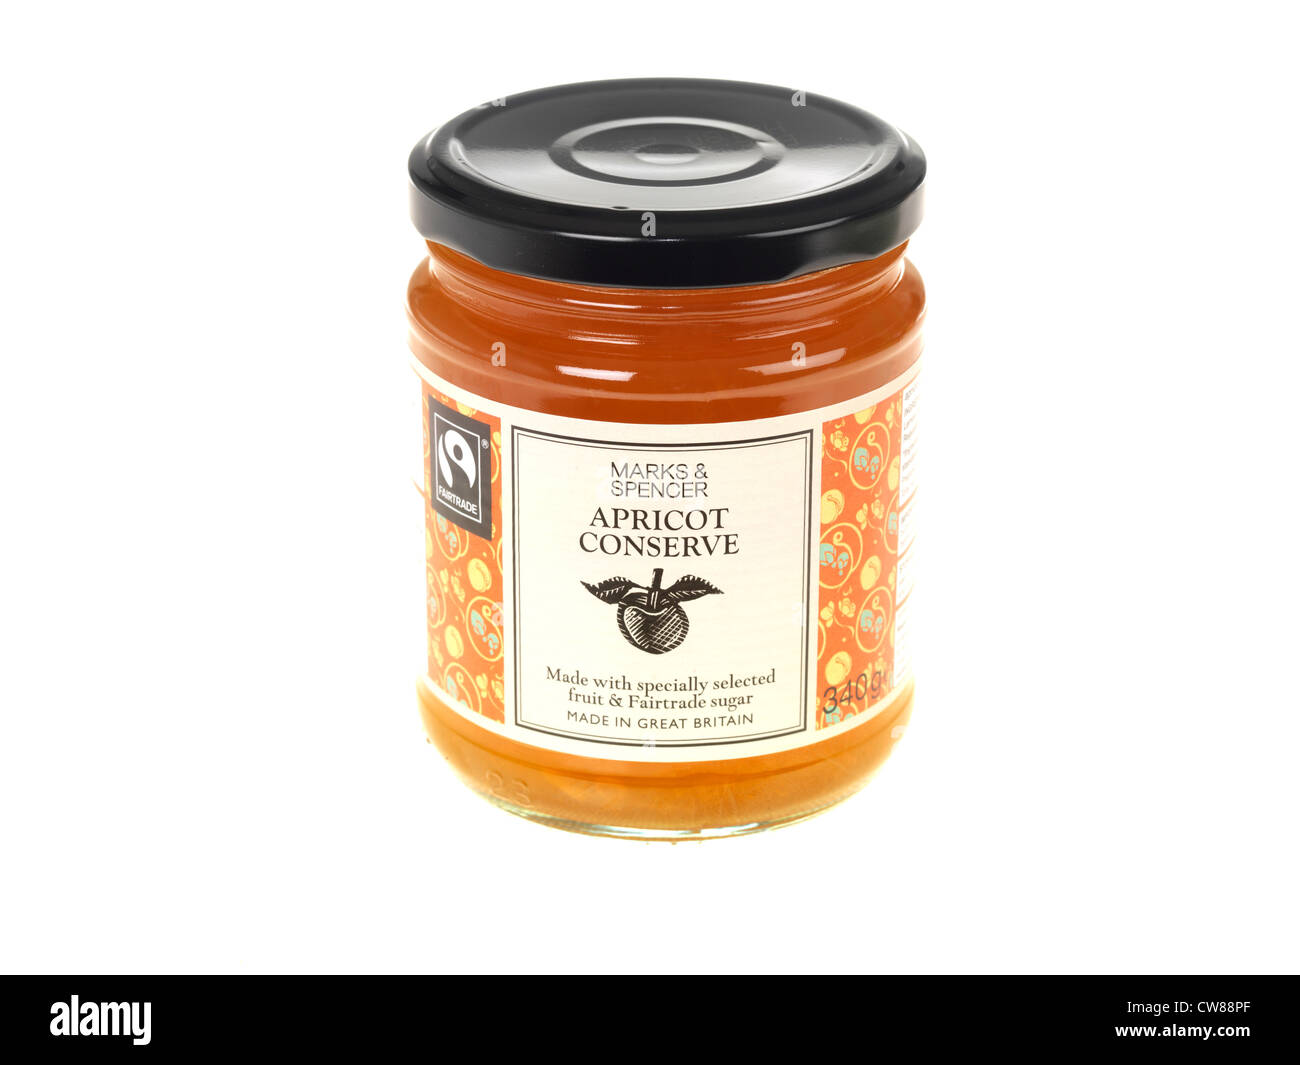 Apricot Conserve - Stock Image